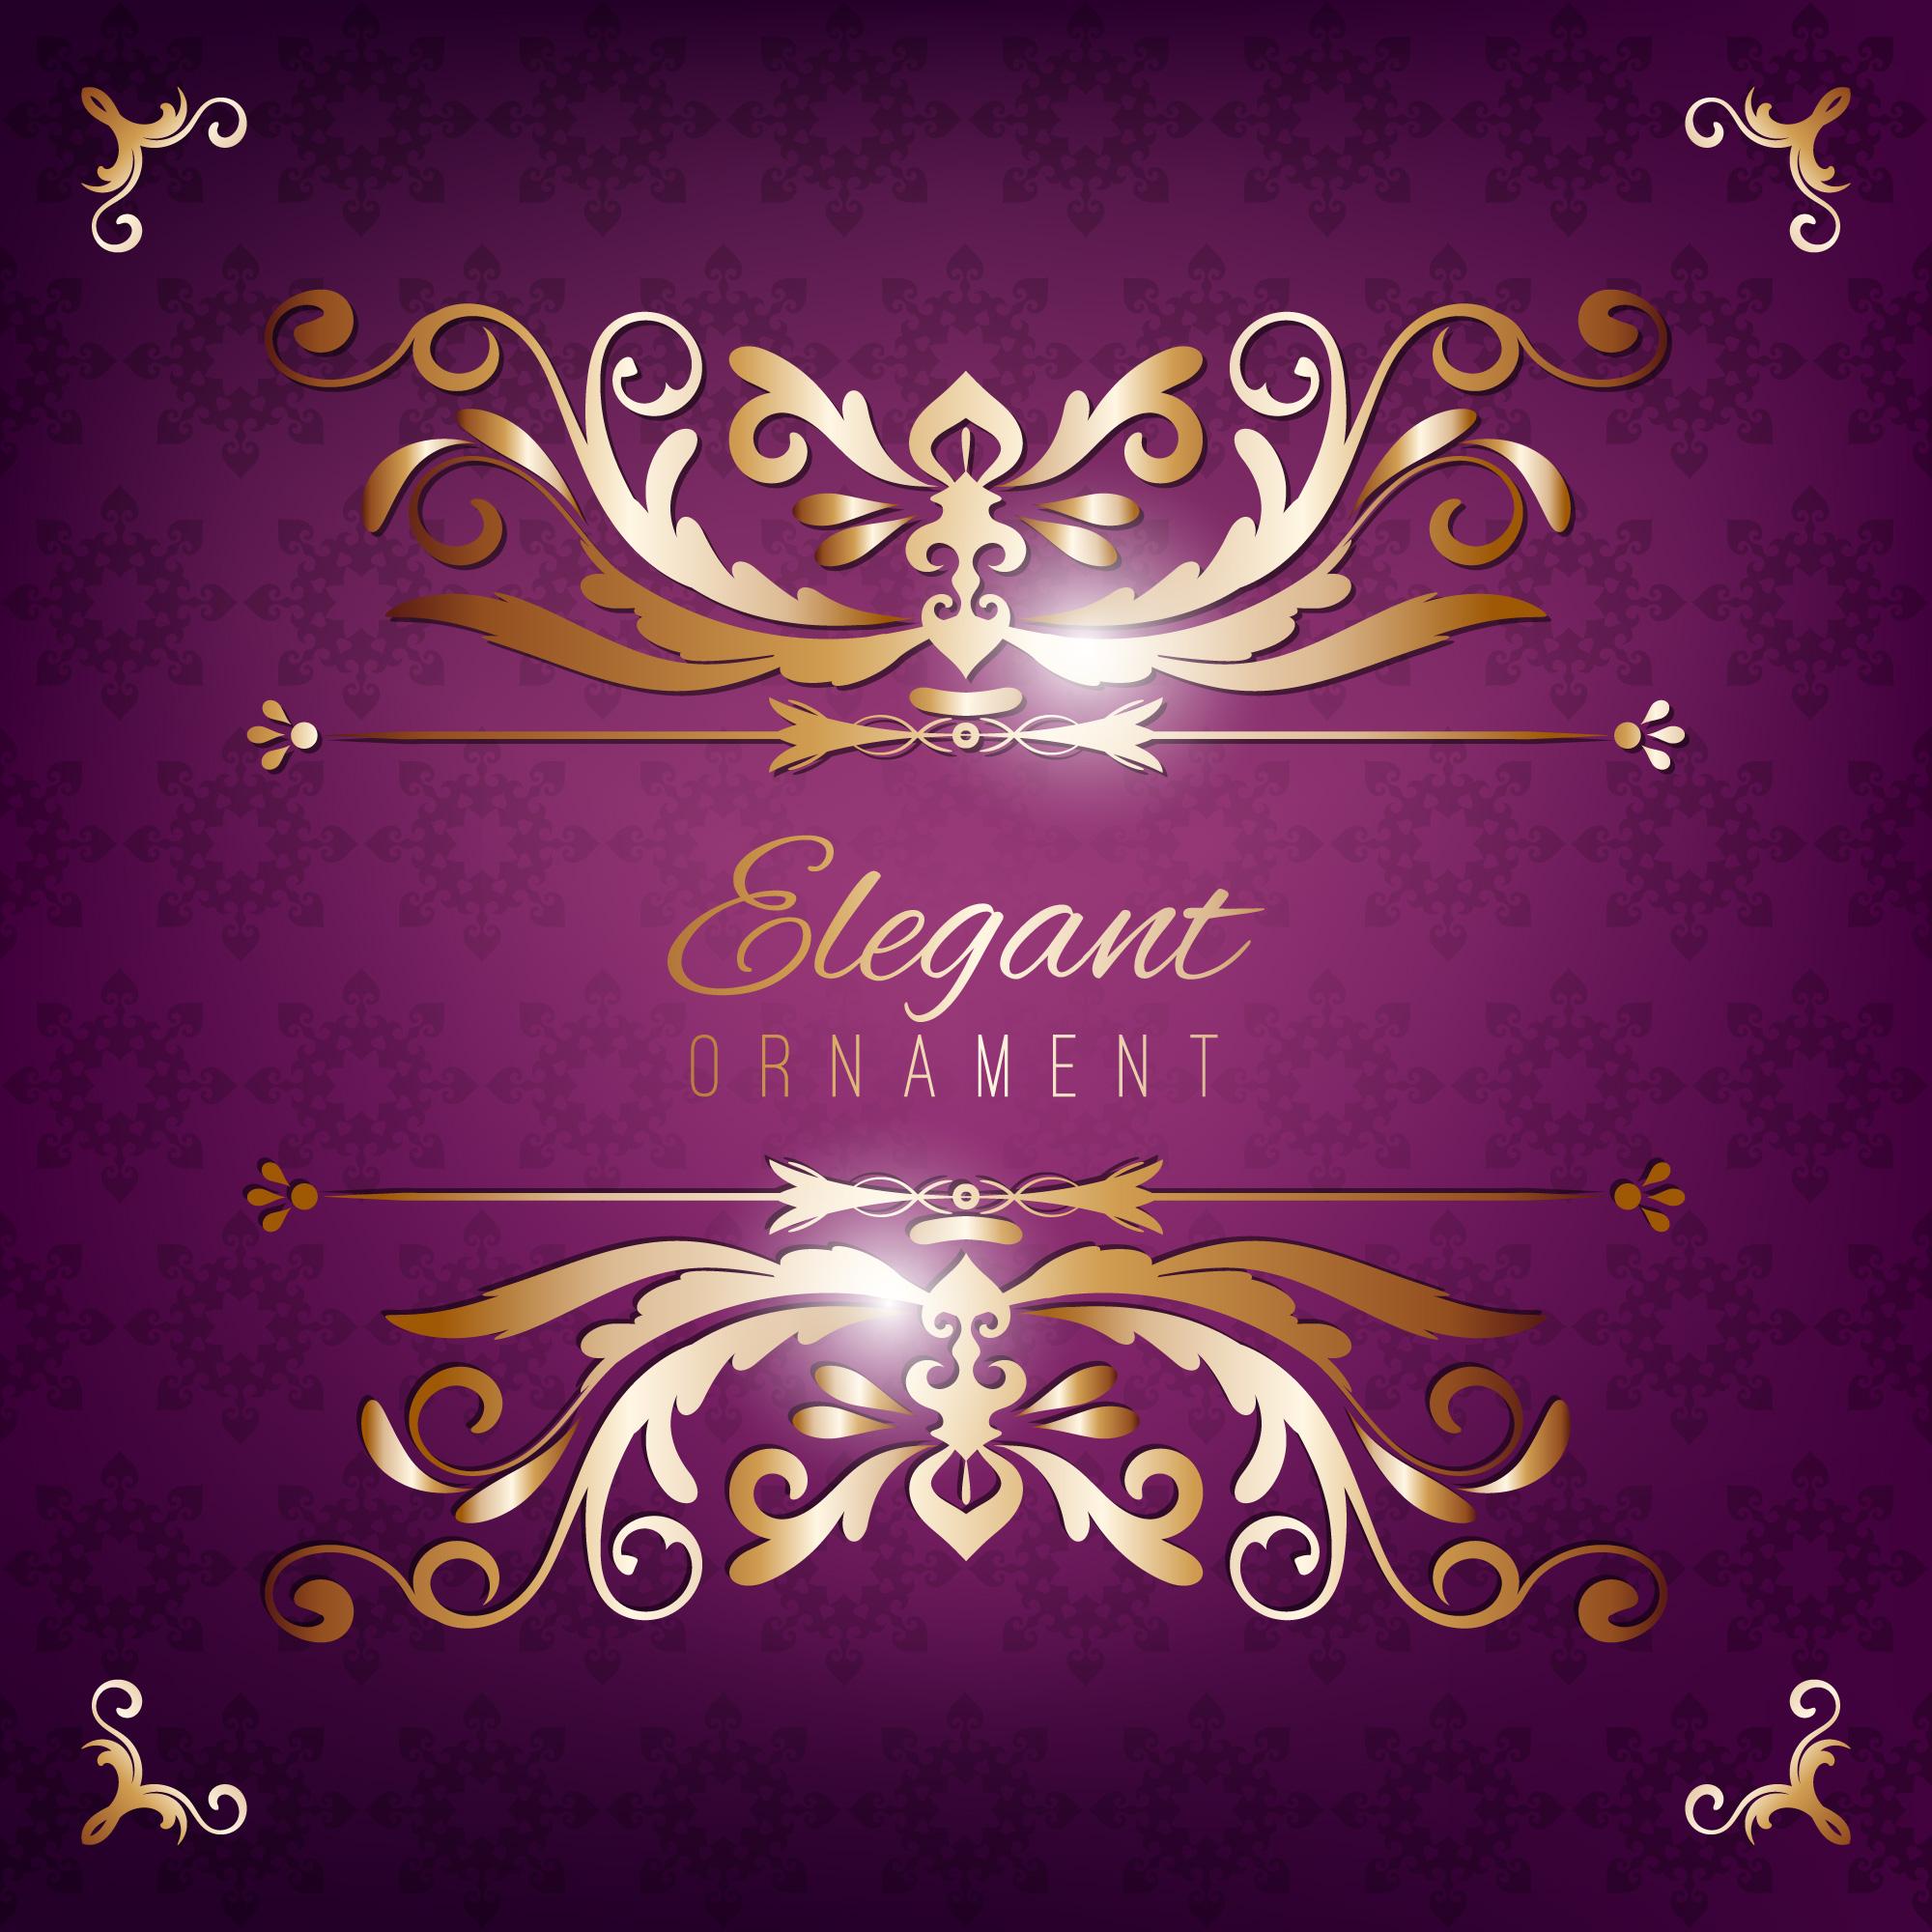 vintage invitation card purple luxury background with